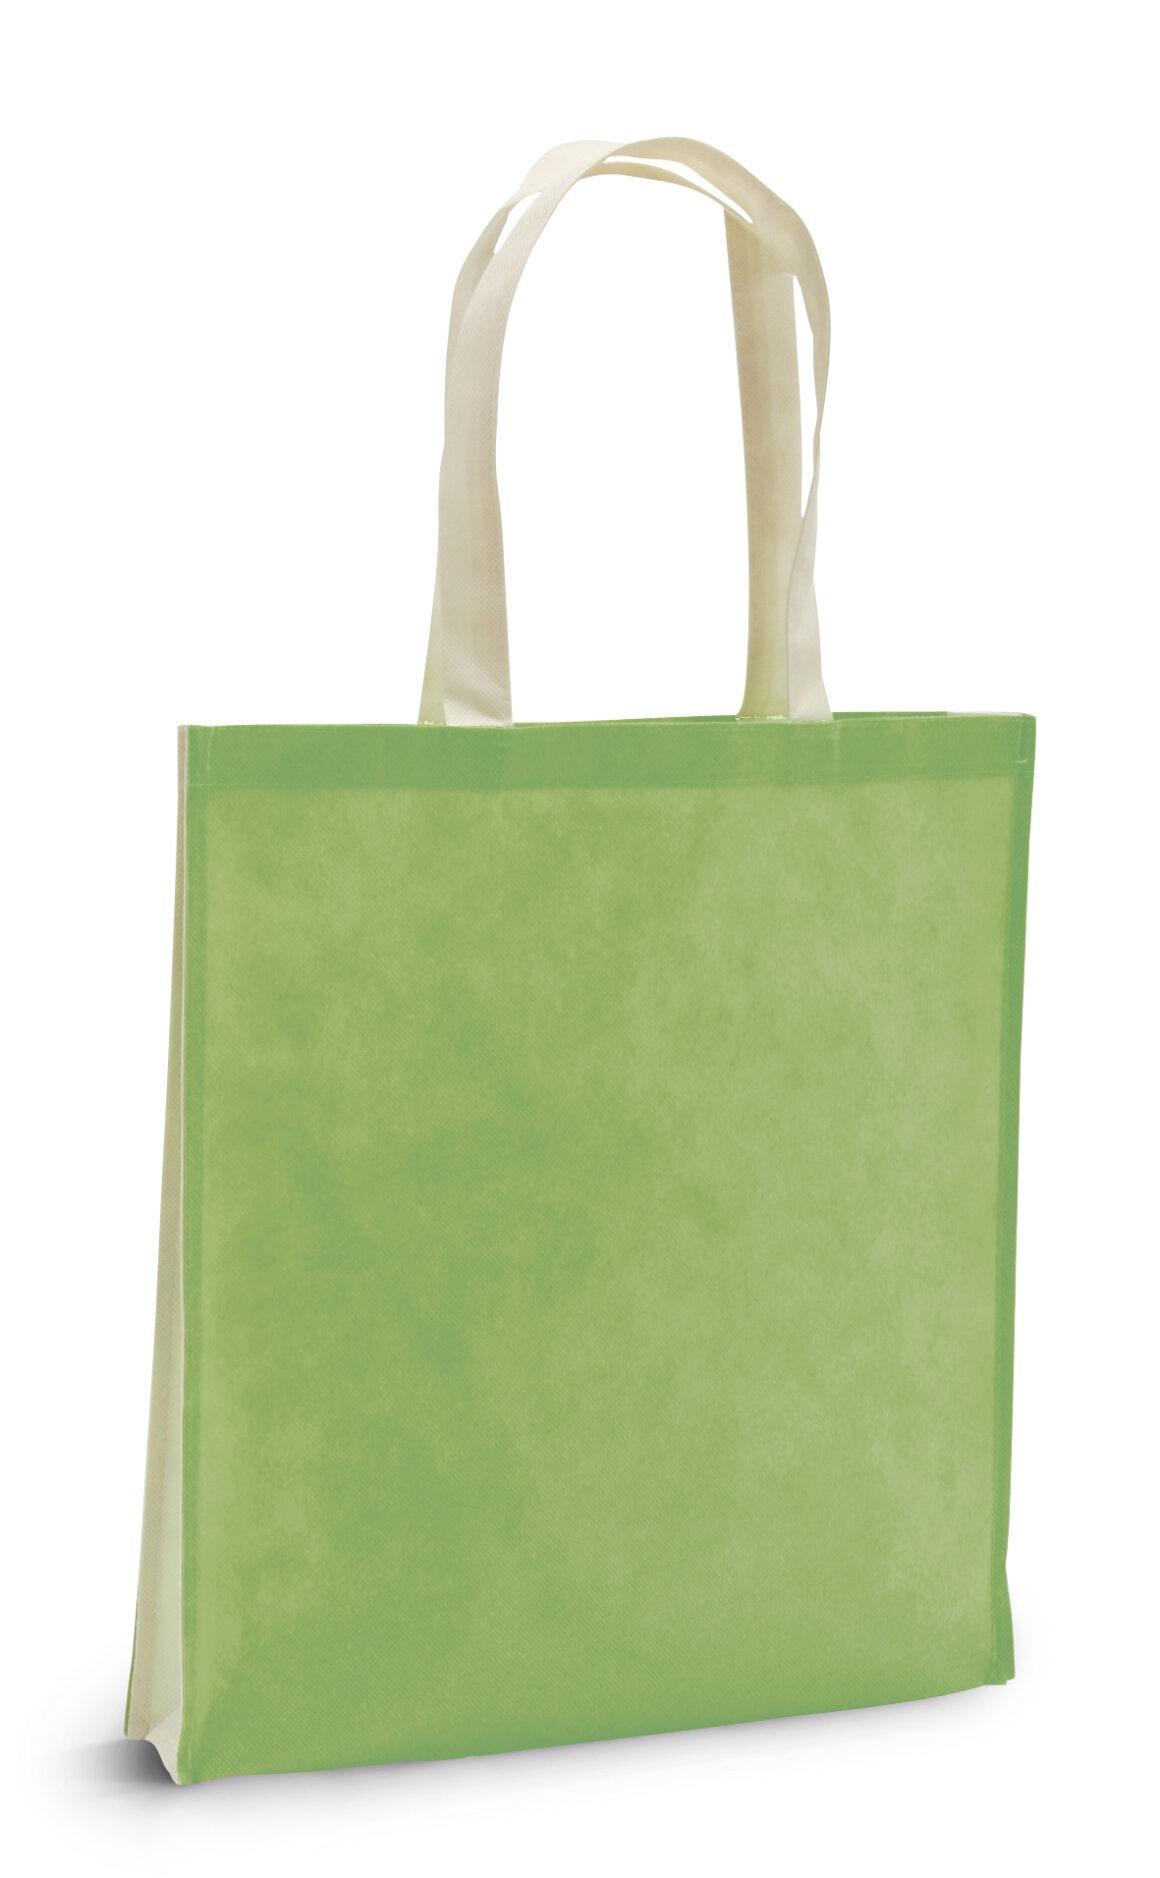 Santo Environmentally friendly Bag Product Code GP92448